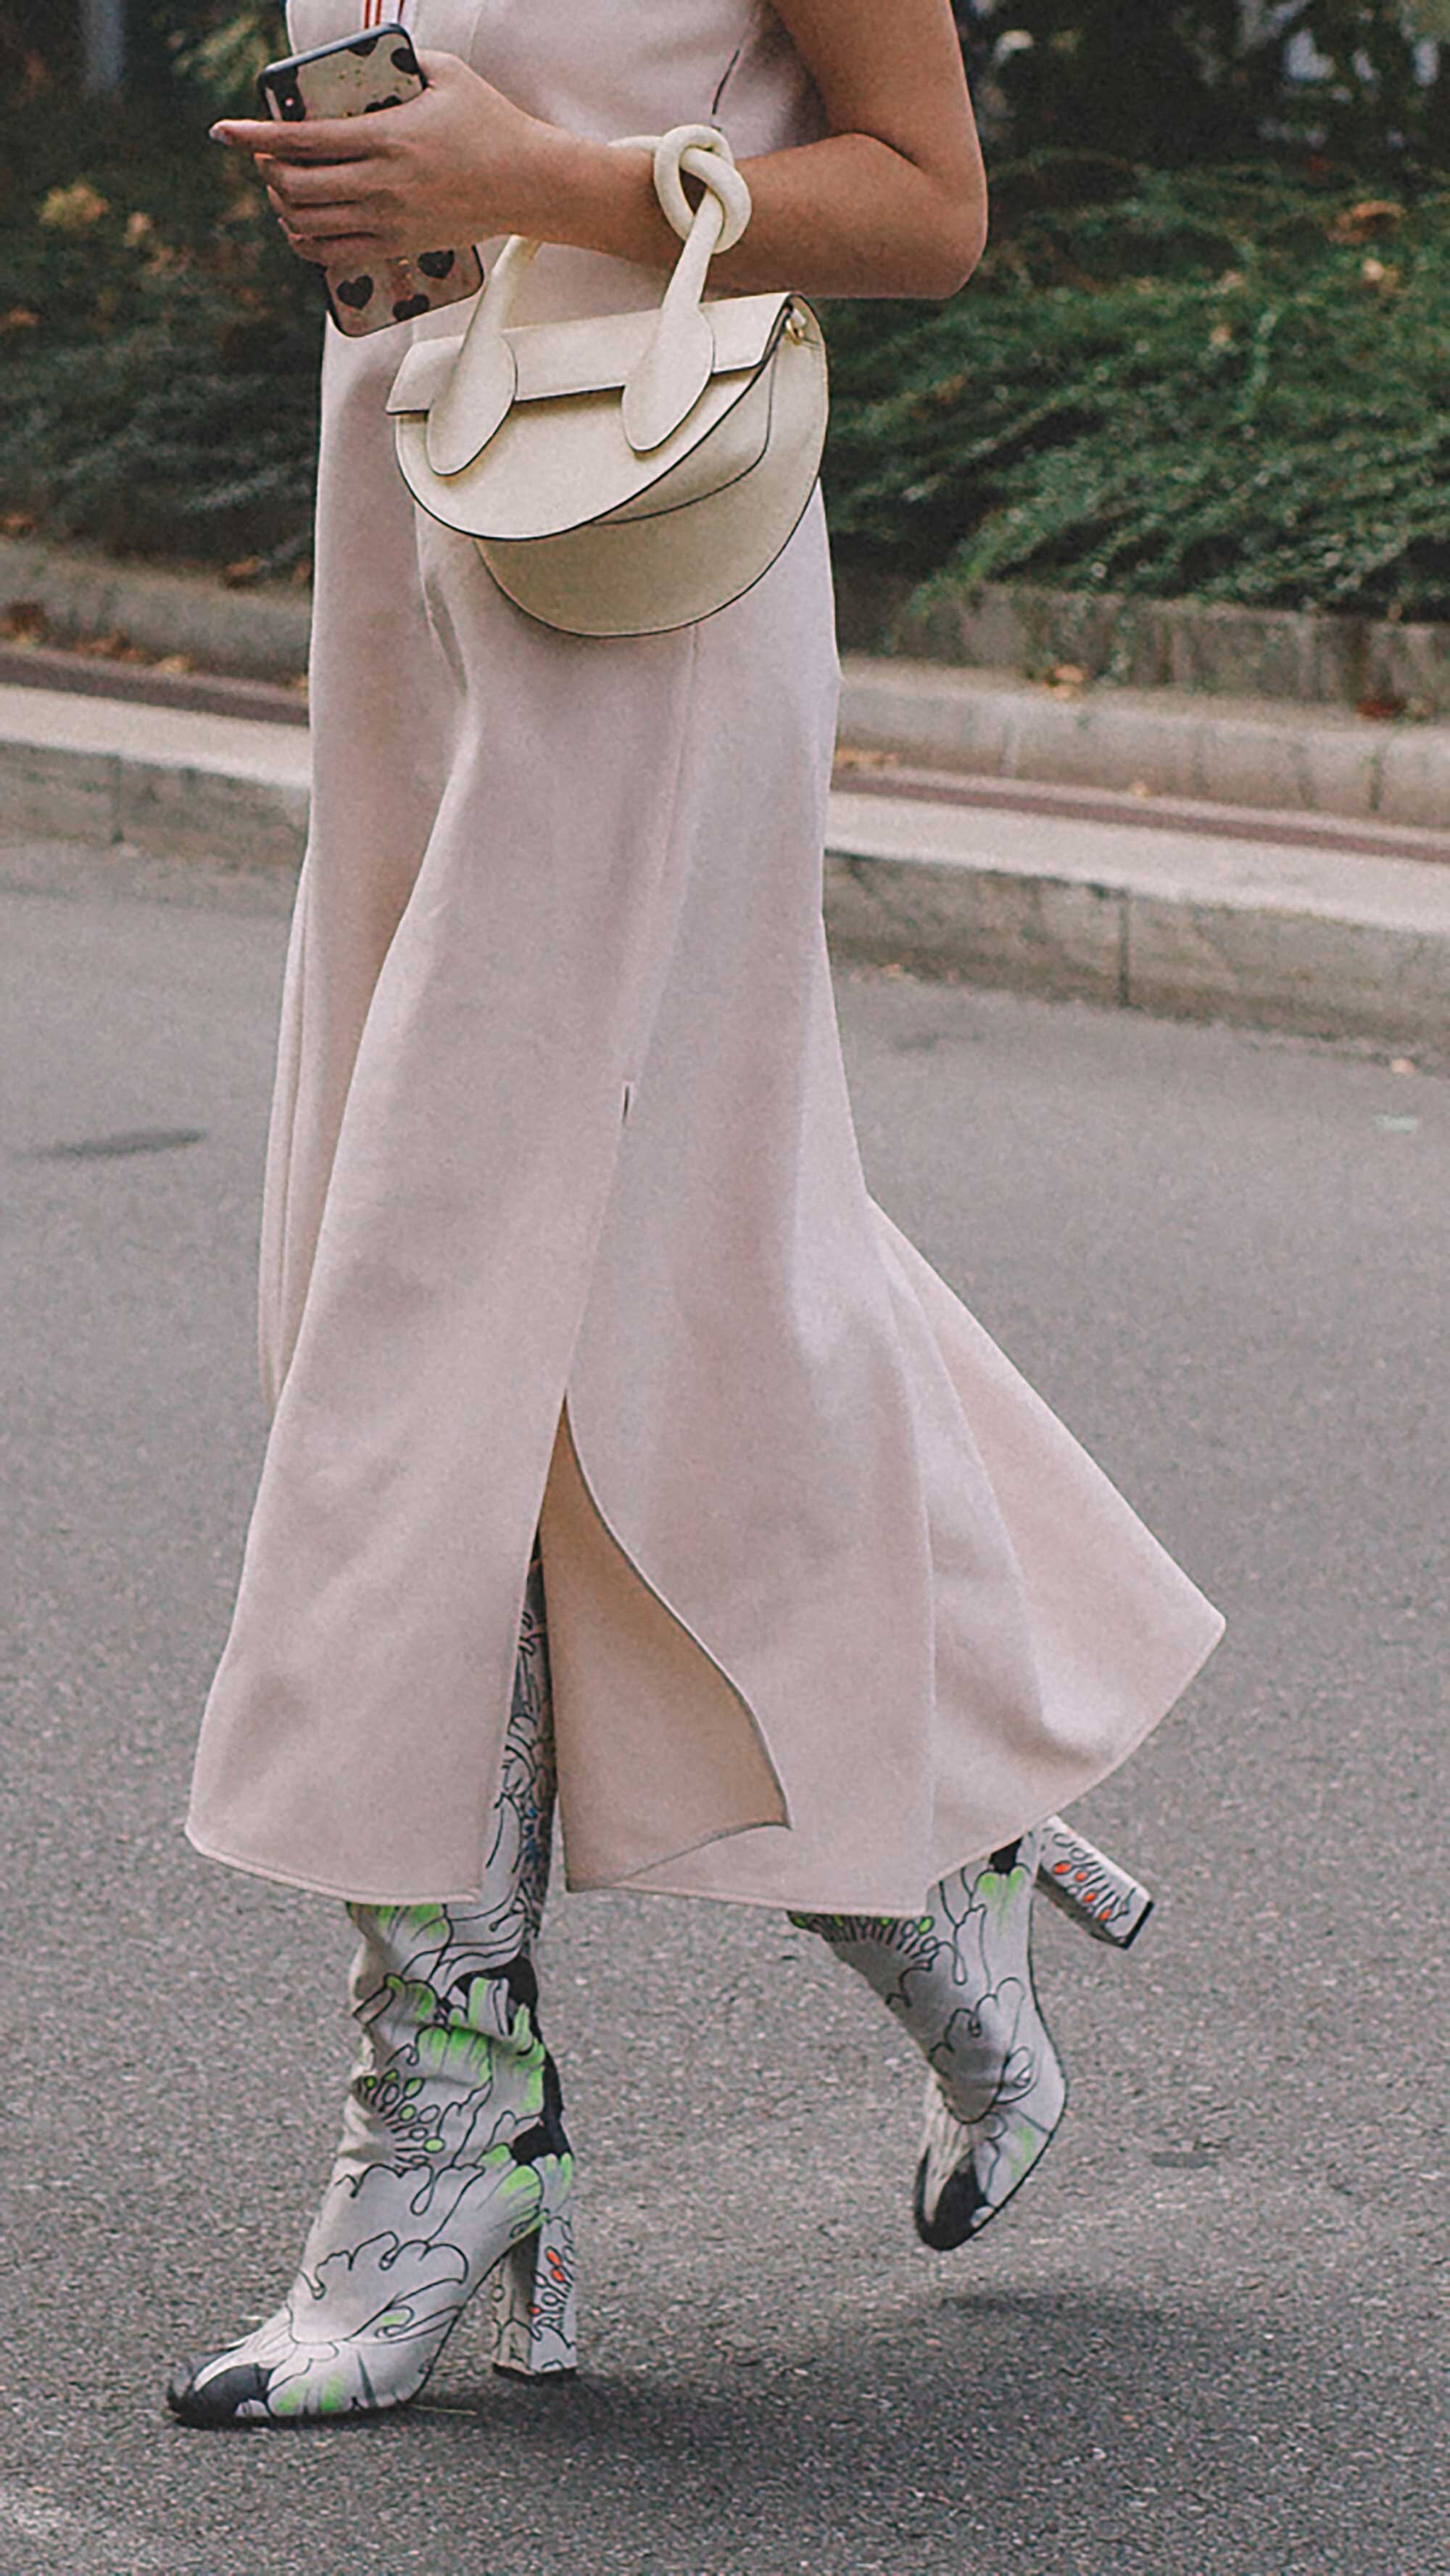 Best outfits of Milan Fashion Week street style 2019 day three MFW SS20 Photo by @J2martinez -62.jpg